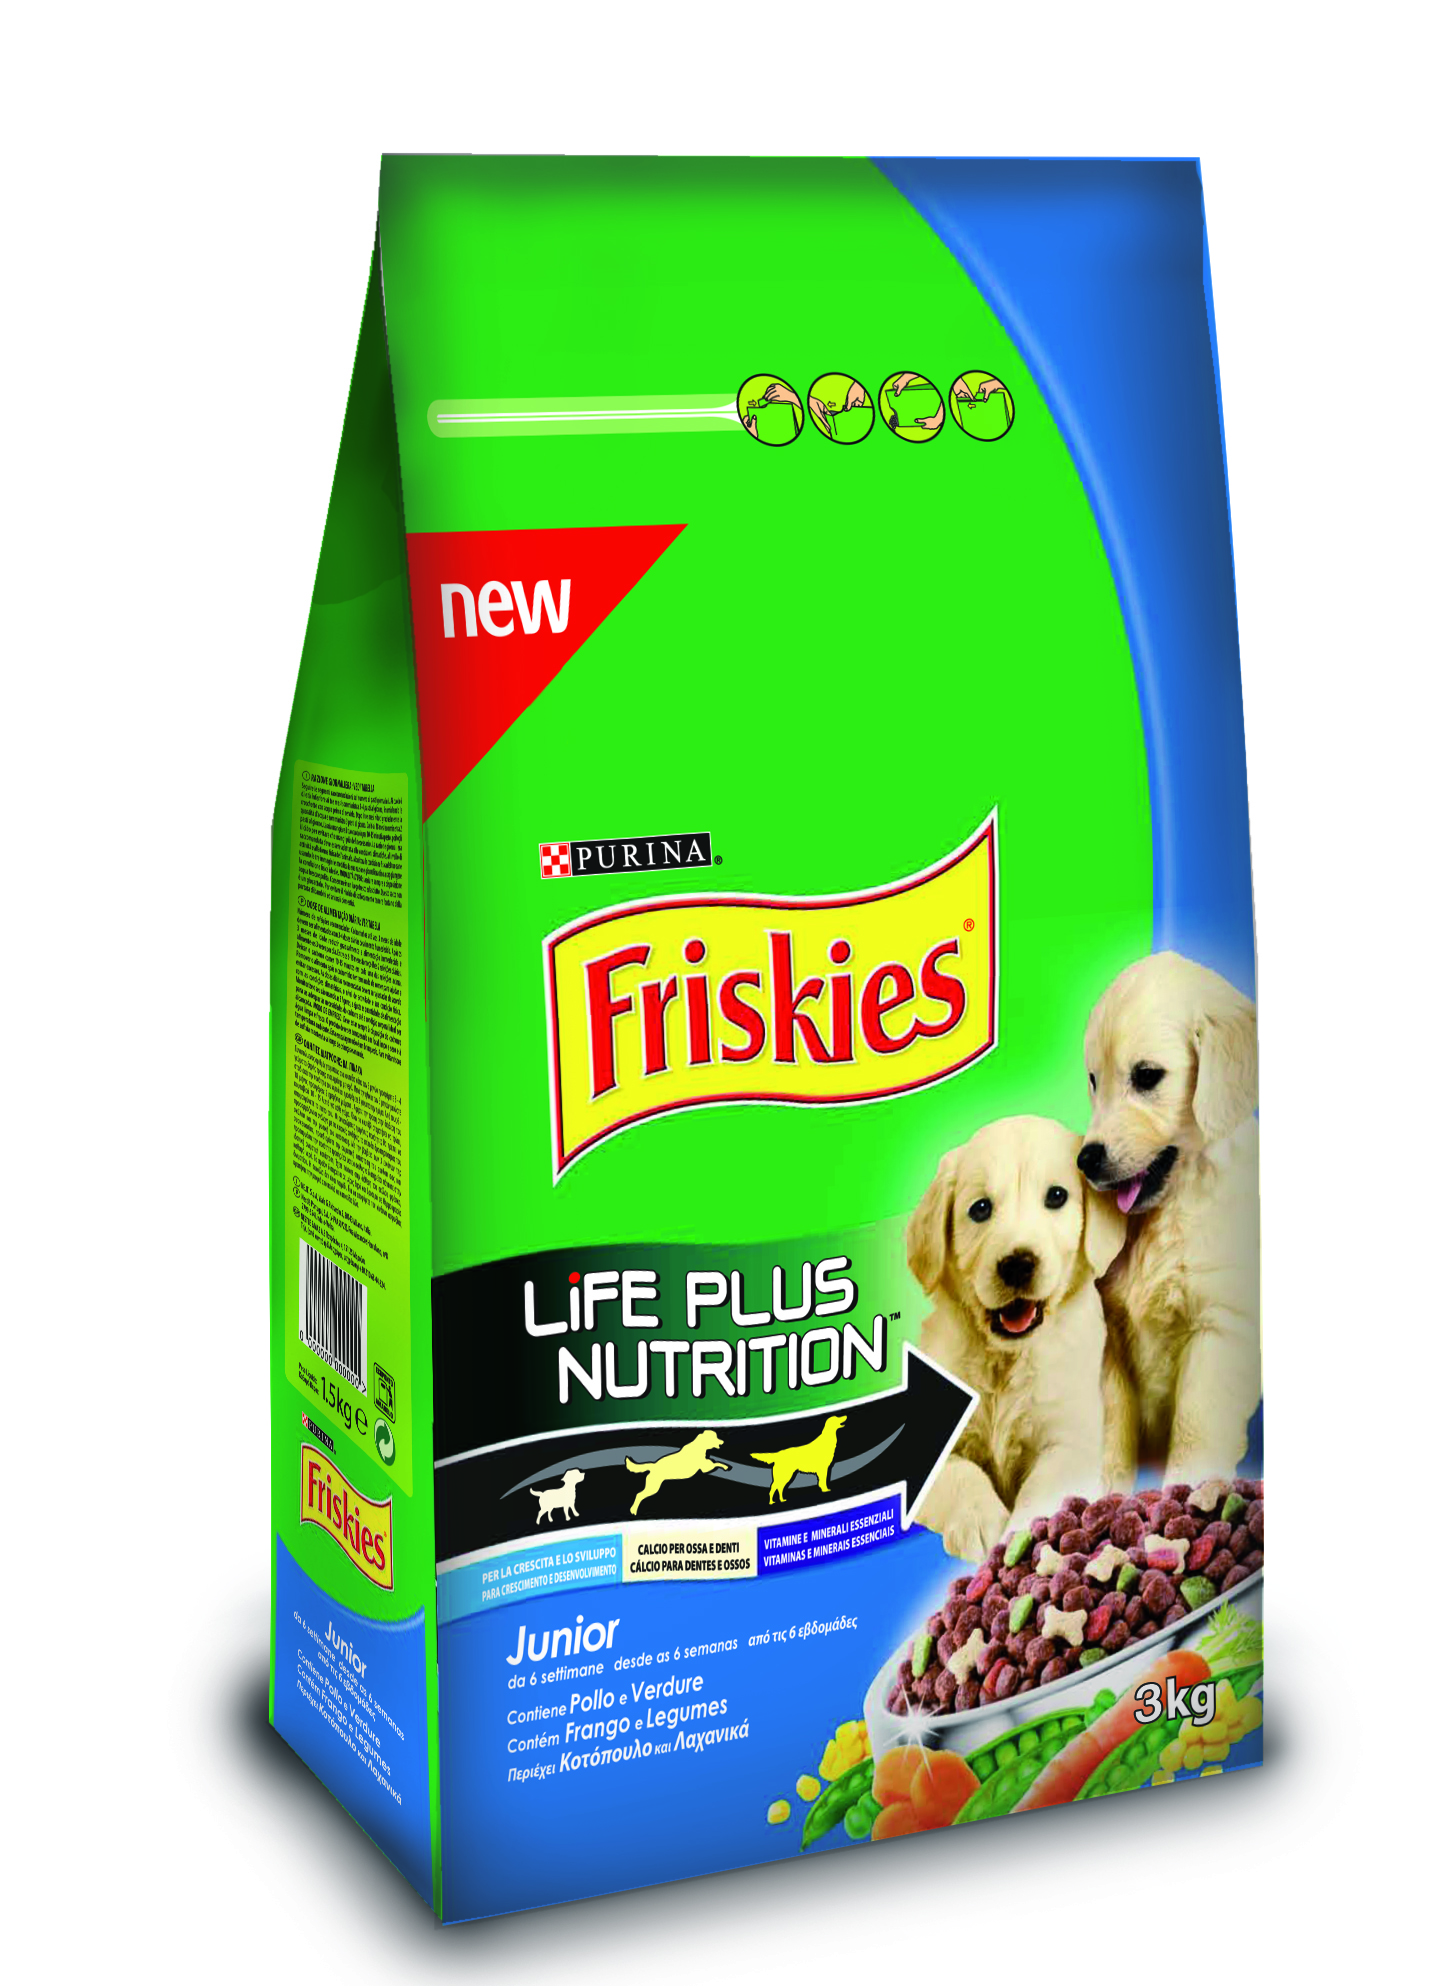 PURINA - FRISKIES LIFE PLUS NUTRITION